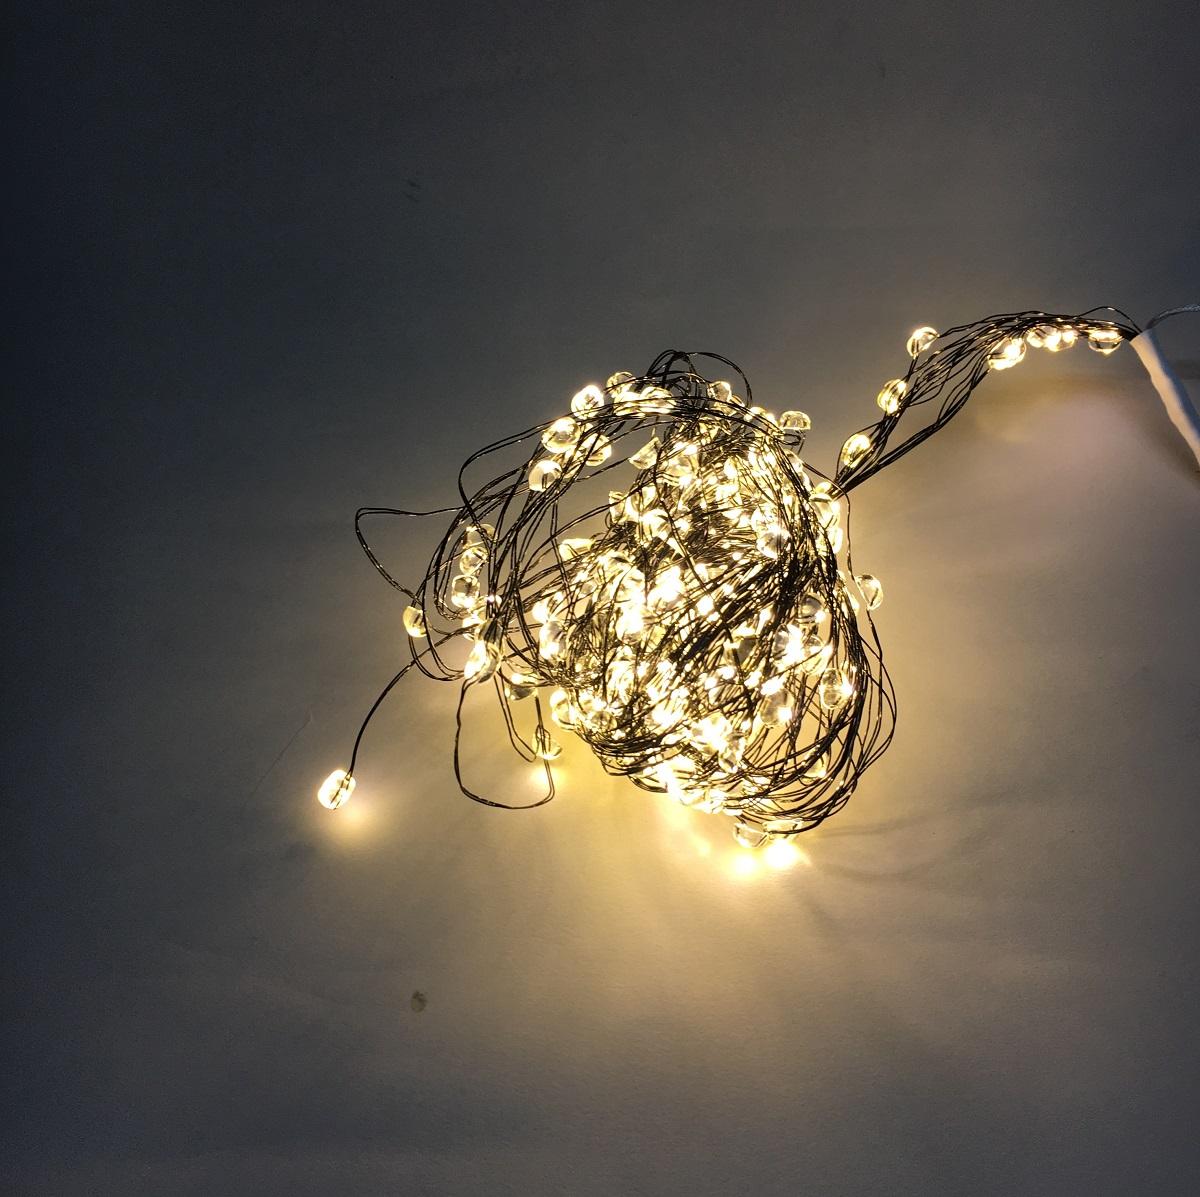 lampenhelden am design led lichterkette led regen big bubble schwarz 180 lichter innen au en. Black Bedroom Furniture Sets. Home Design Ideas